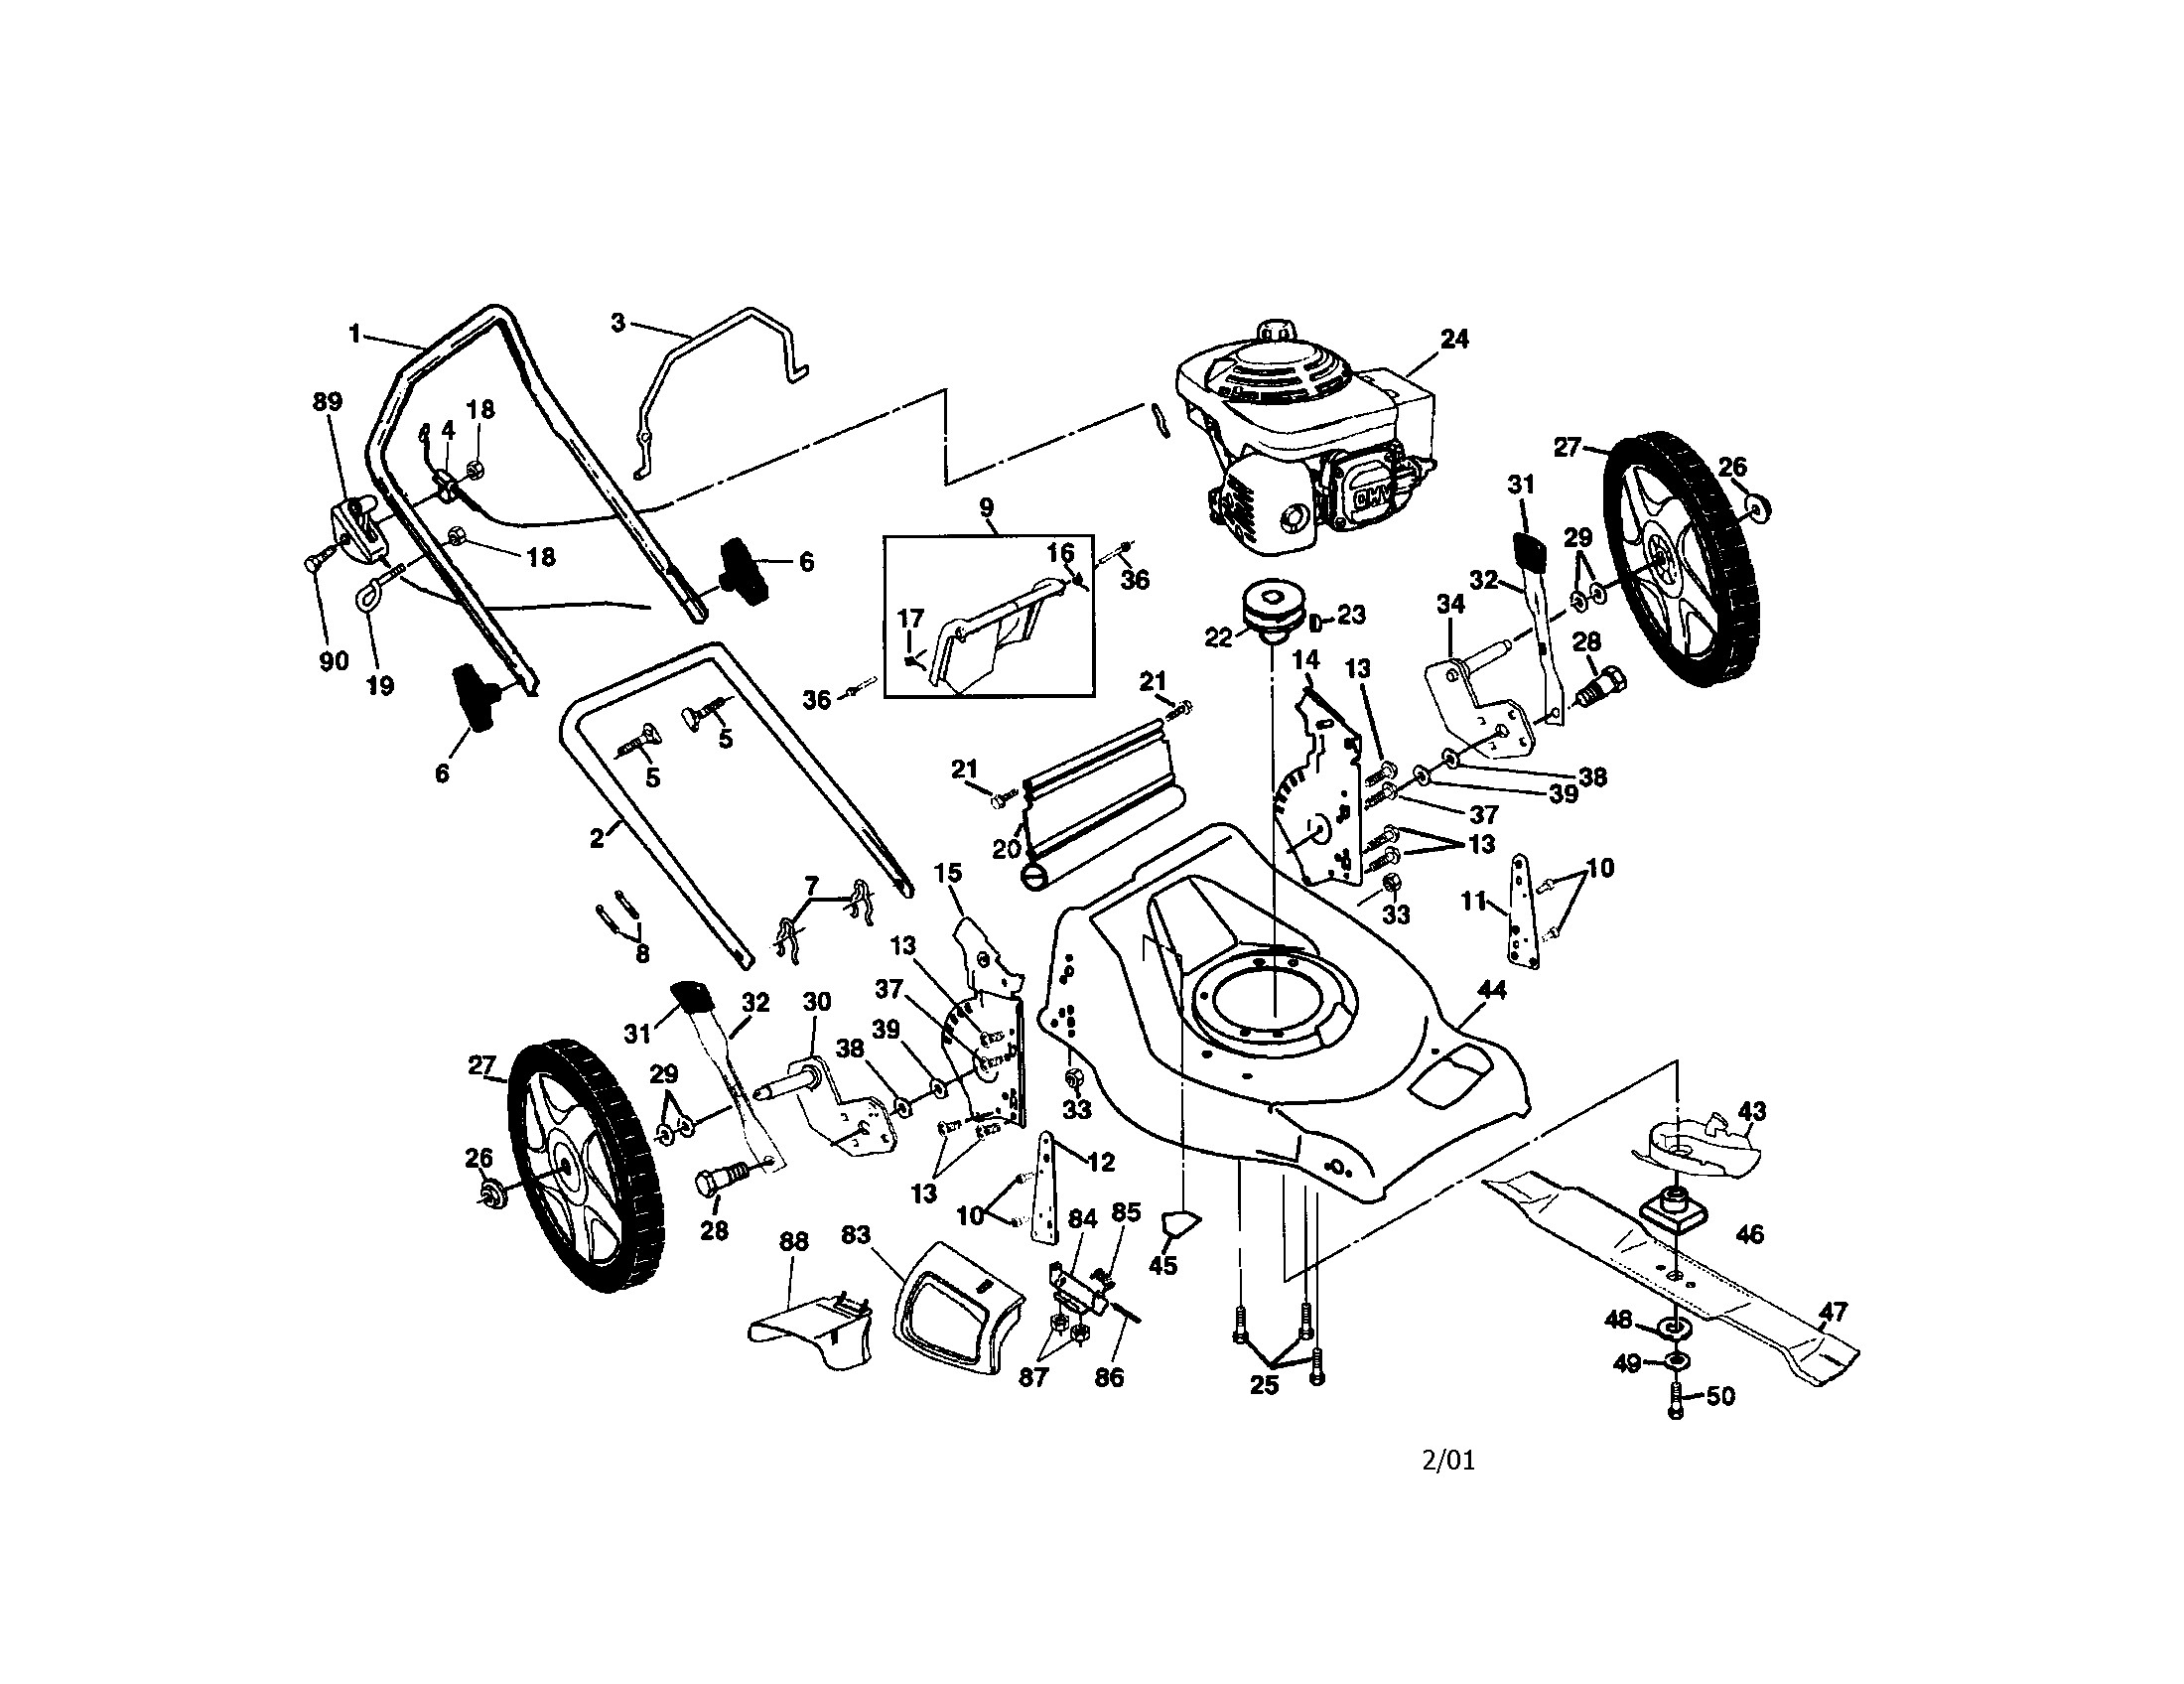 Dixon Lawn Mower Parts Diagram Craftsman Lt1000 Riding Lawn Mower Pro Wiring Diagram Wiring Of Dixon Lawn Mower Parts Diagram